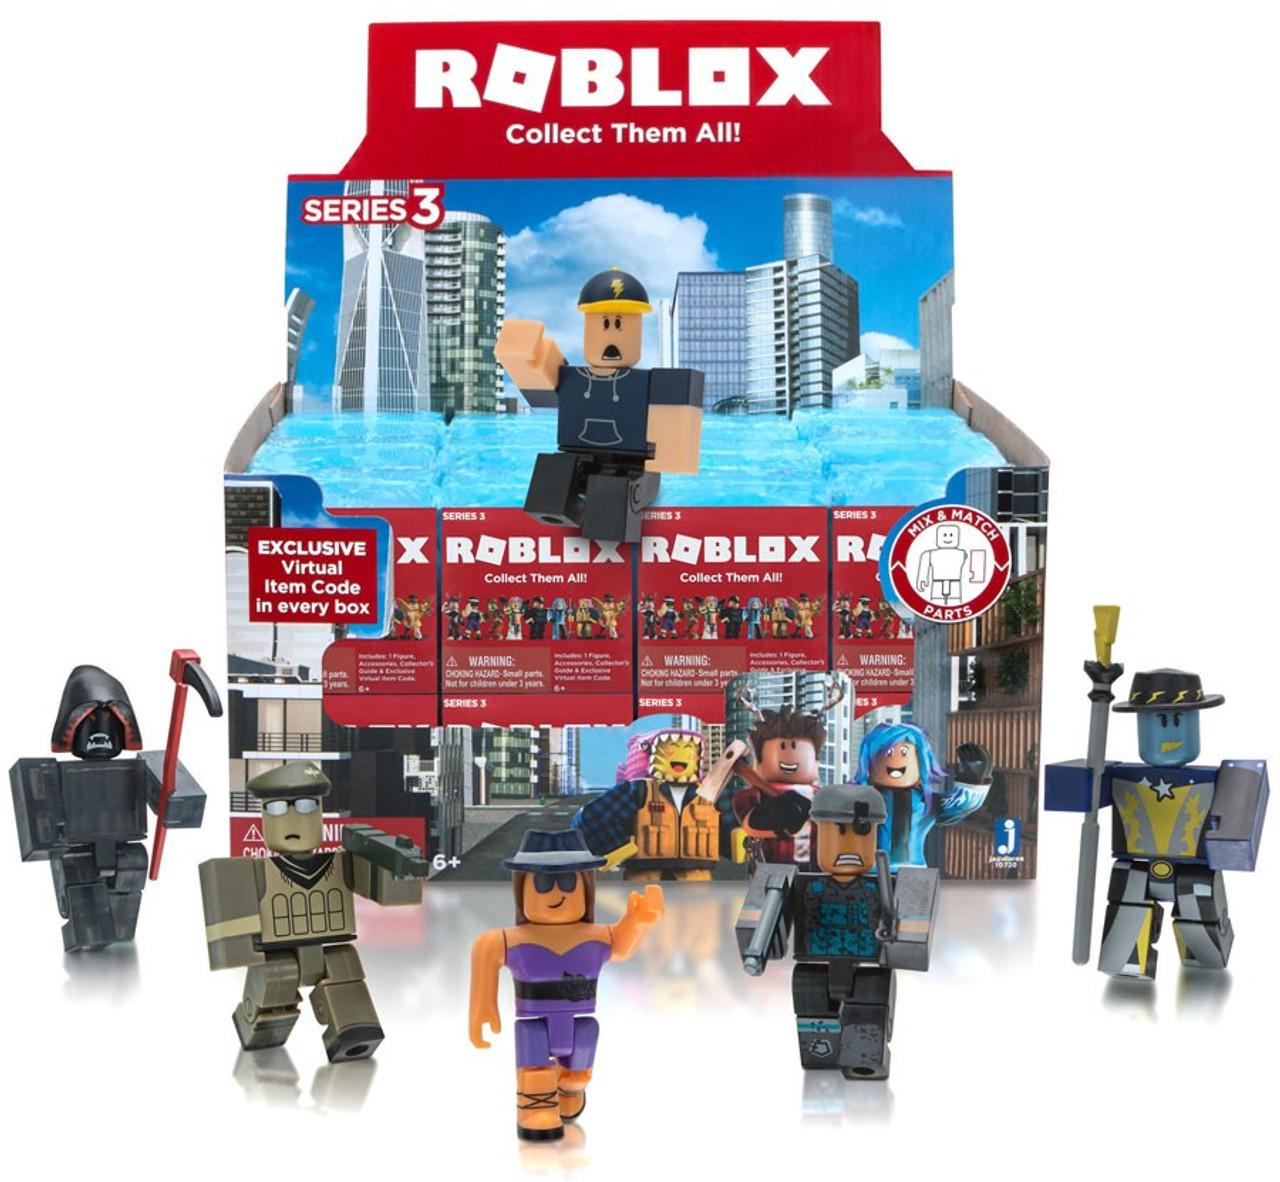 Roblox Series 3 Mystery Box [Blue Cube, 24 Packs]